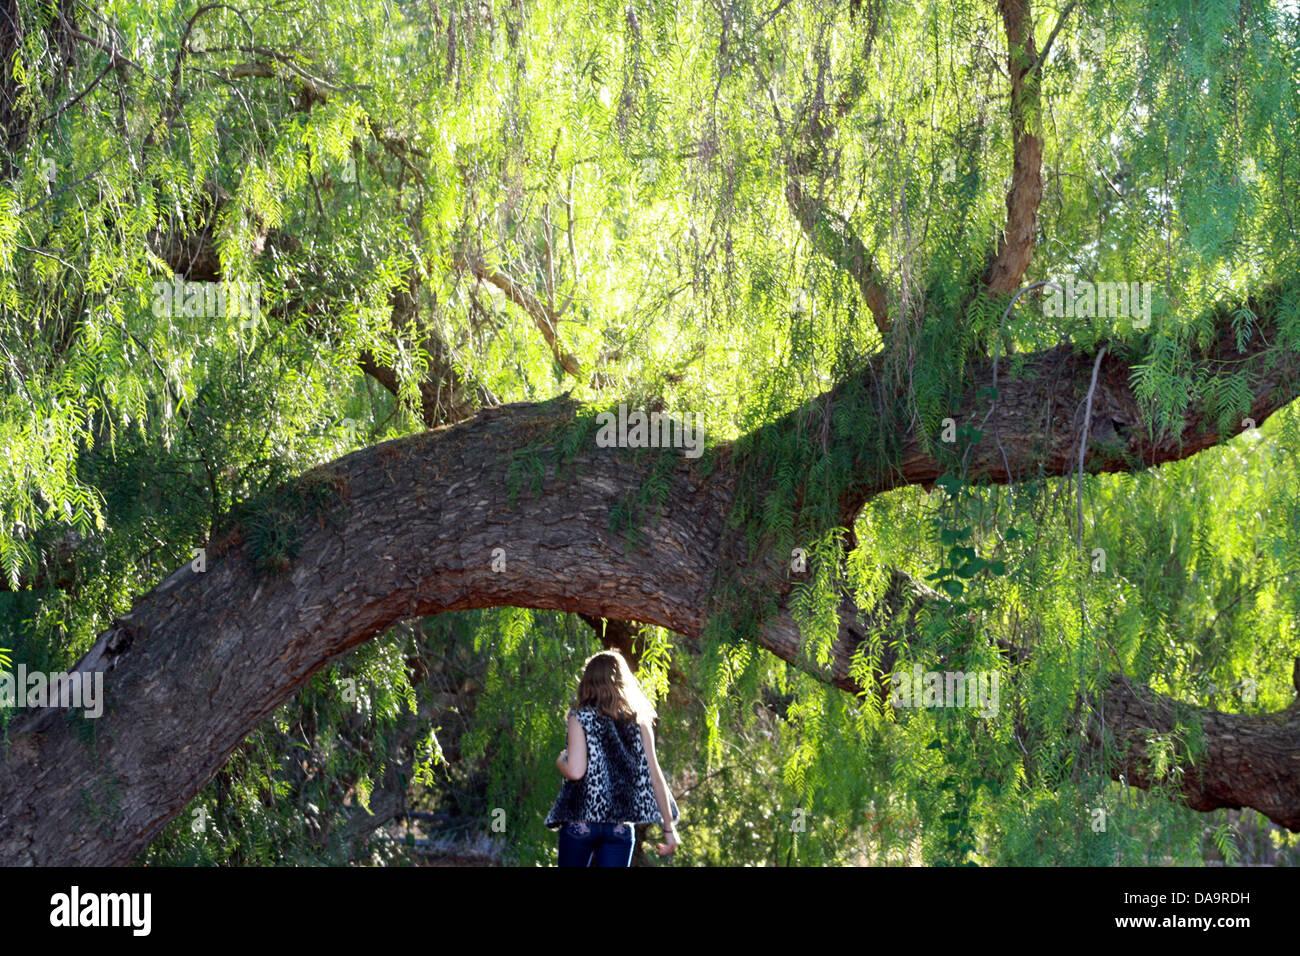 Fille et Willow Tree Banque D'Images